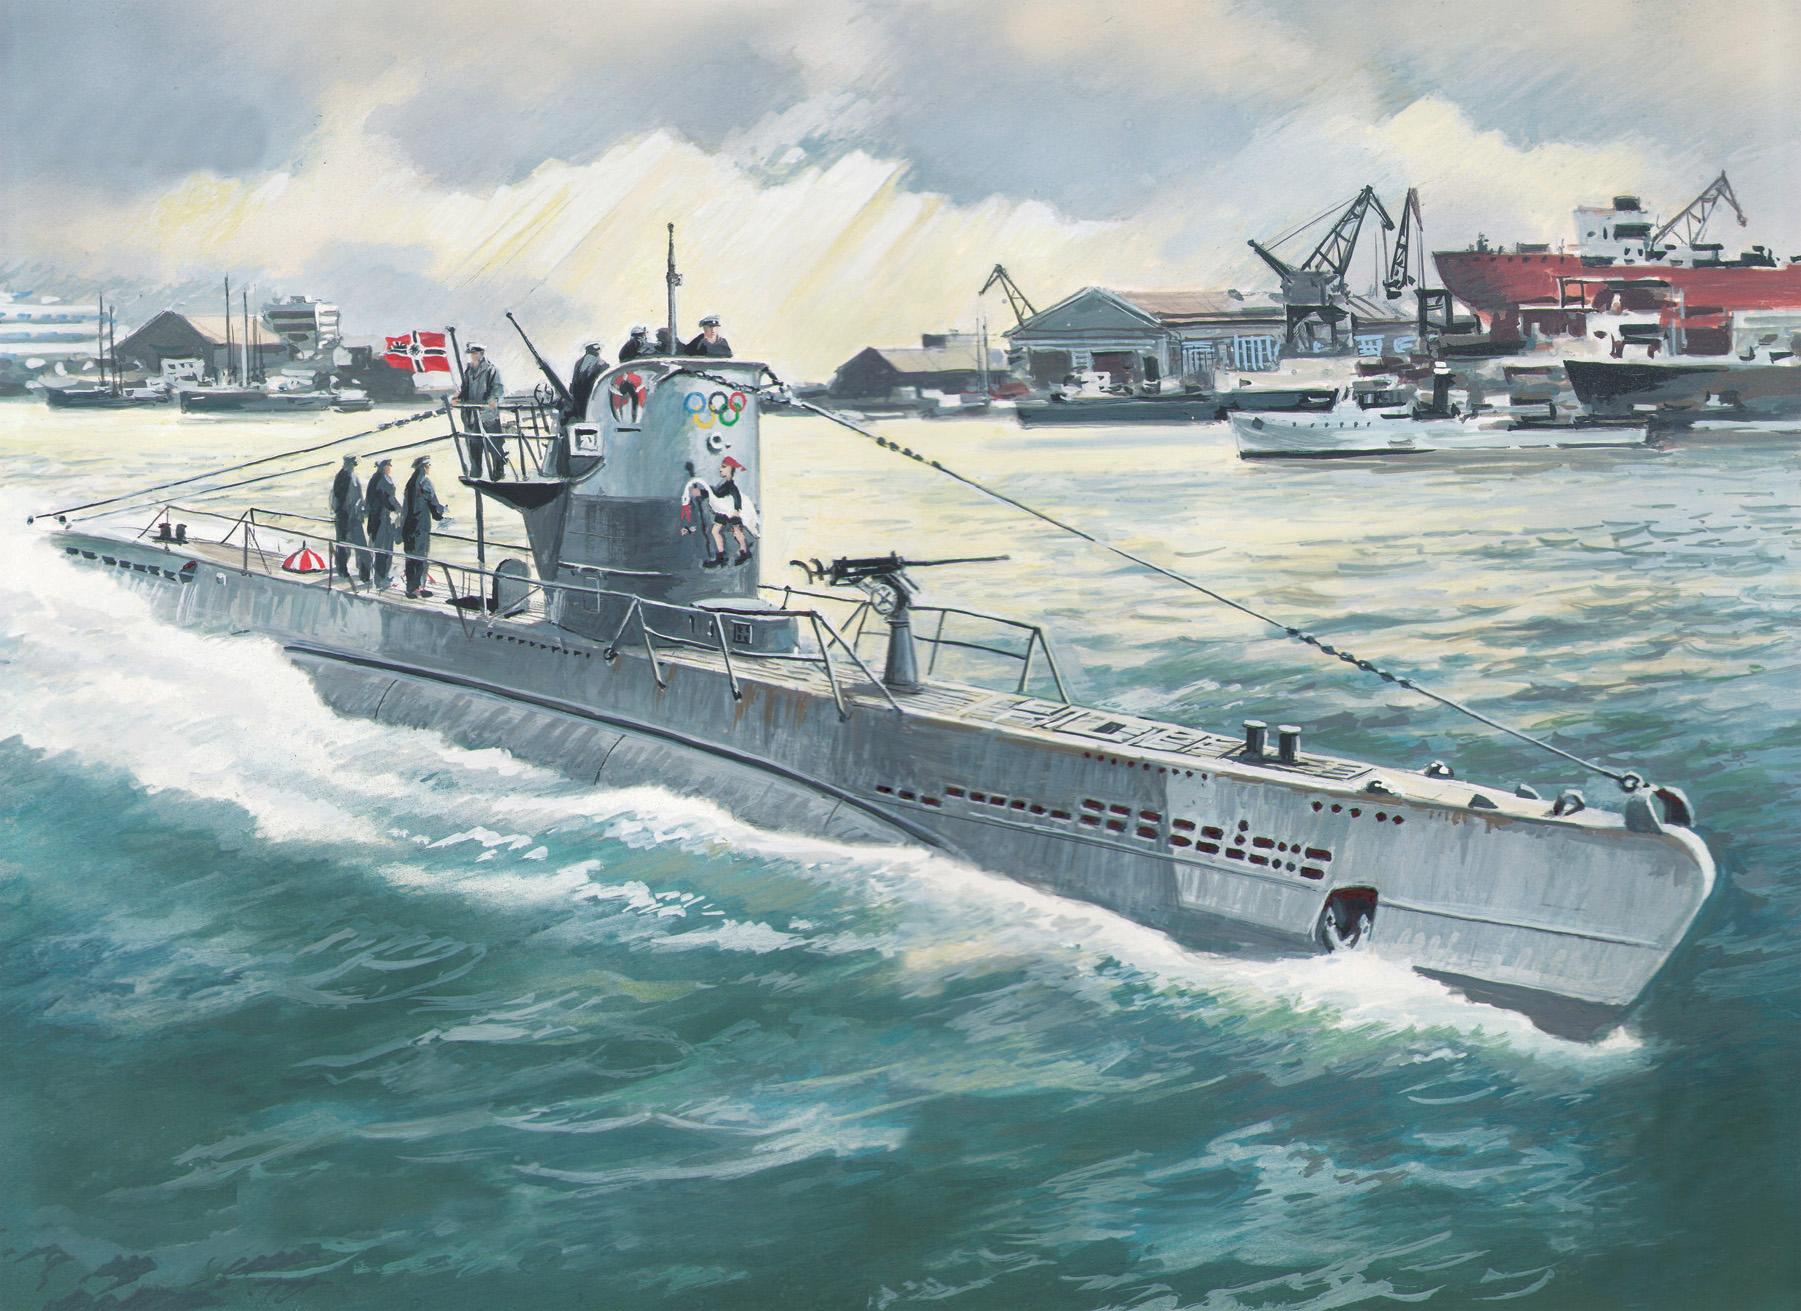 ICM U-Boat Type IIB (1943), German Submarine